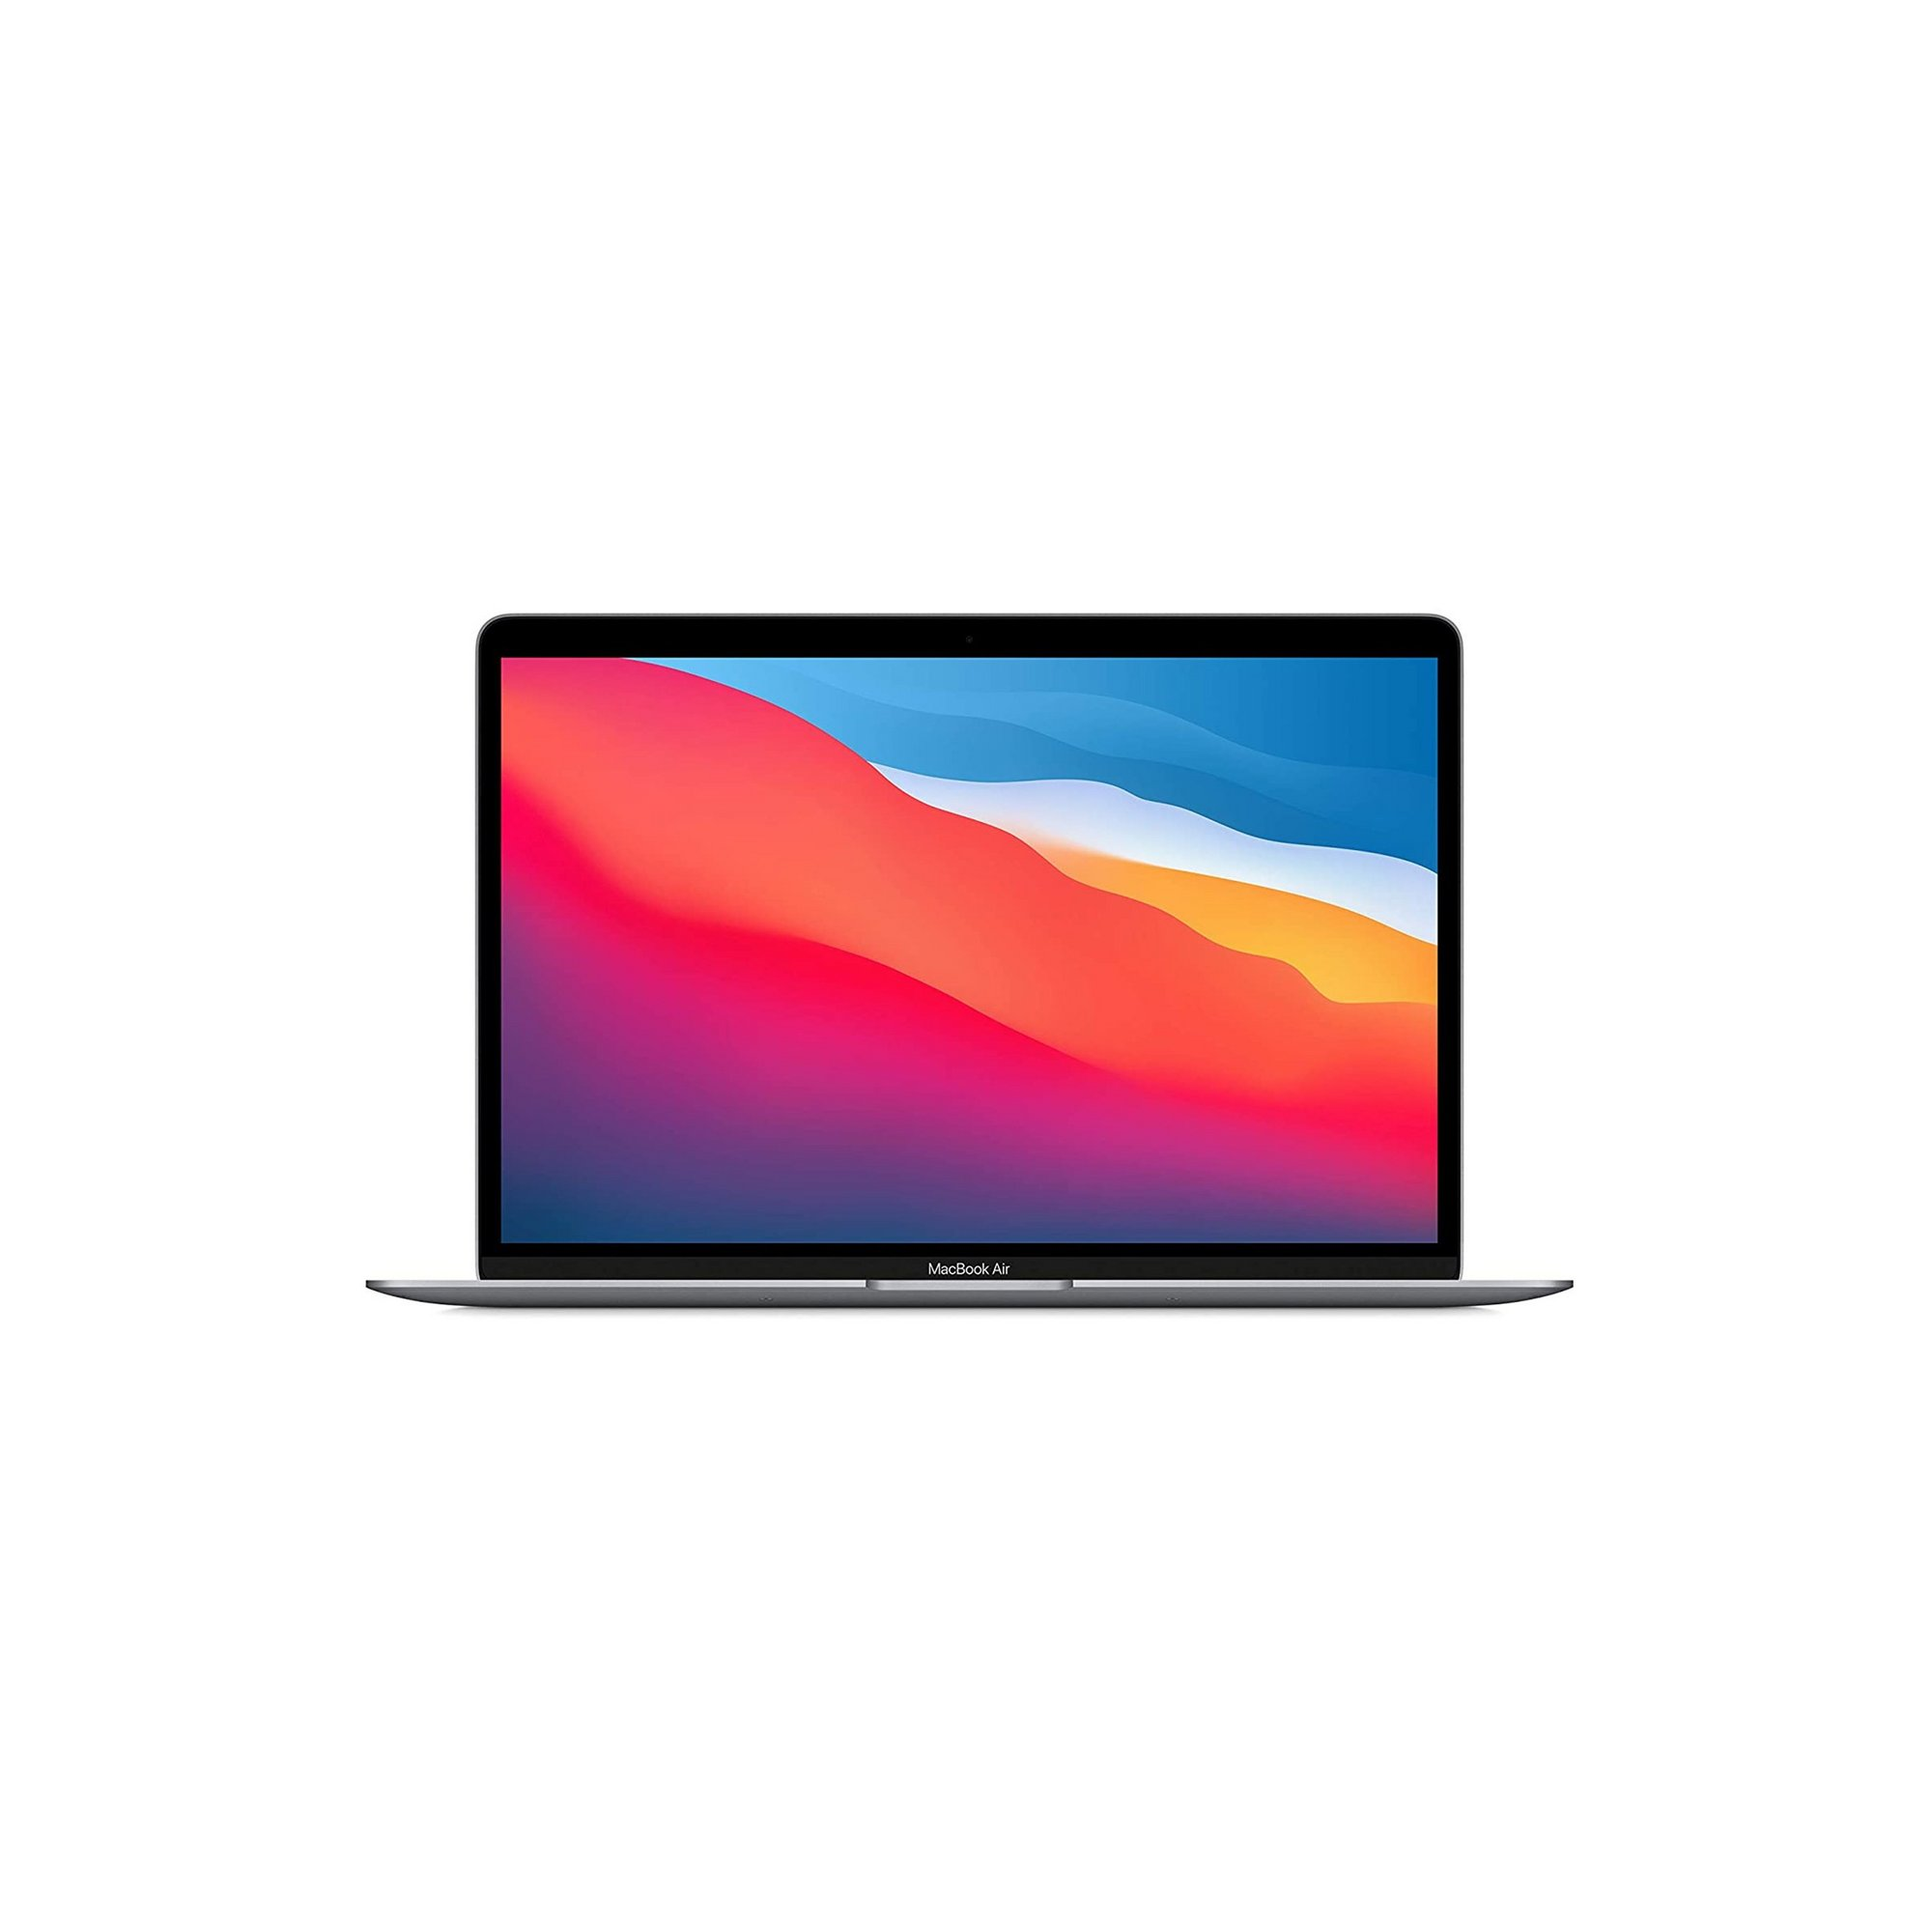 Image of Apple MacBook Air 13 Inch M1 Chip 2020 512GB